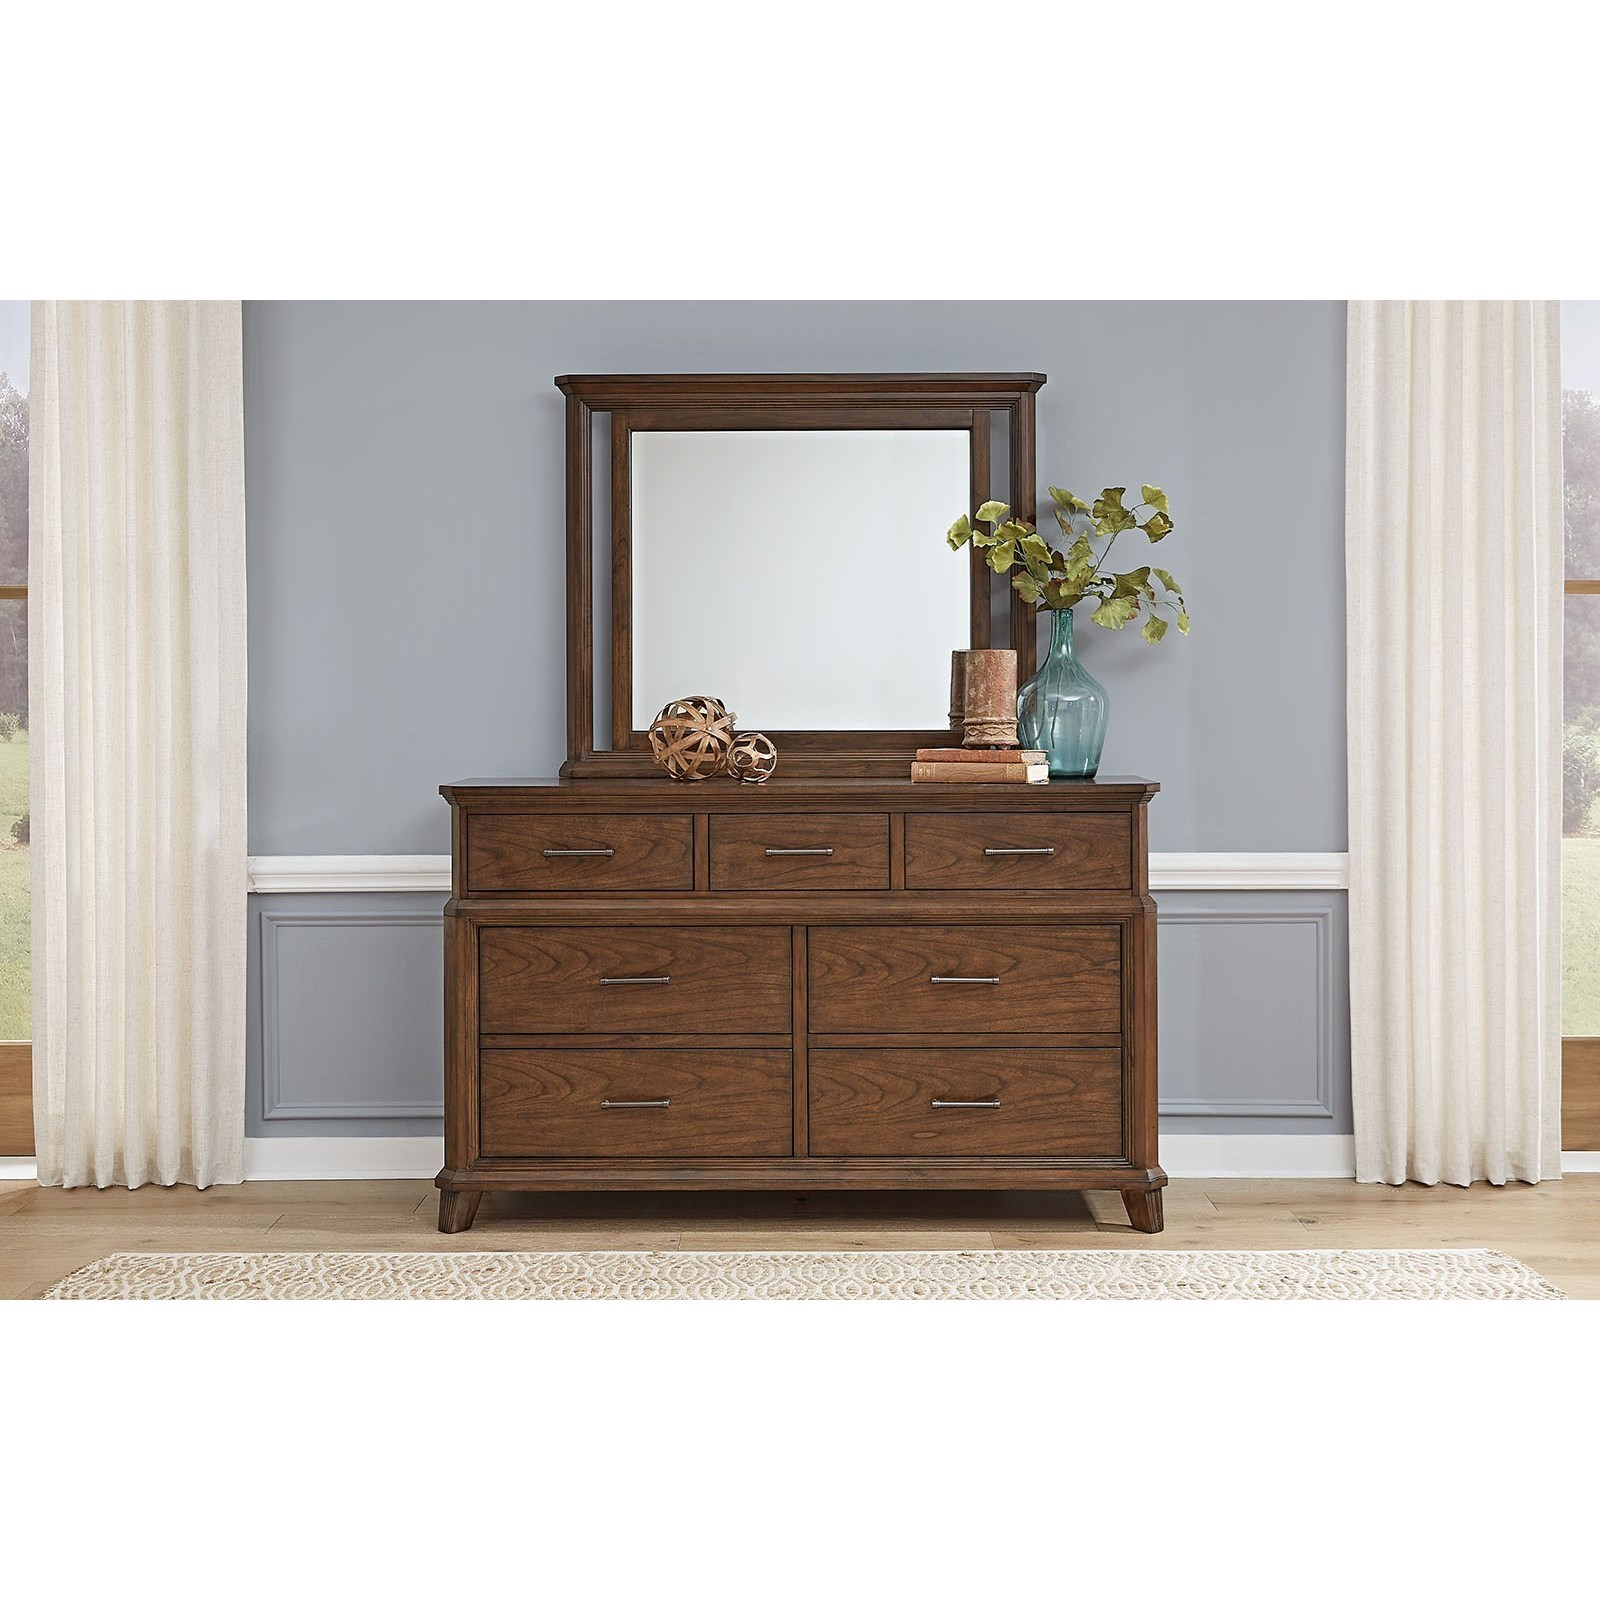 Filson Creek Dresser and Mirror Set by A-A at Walker's Furniture